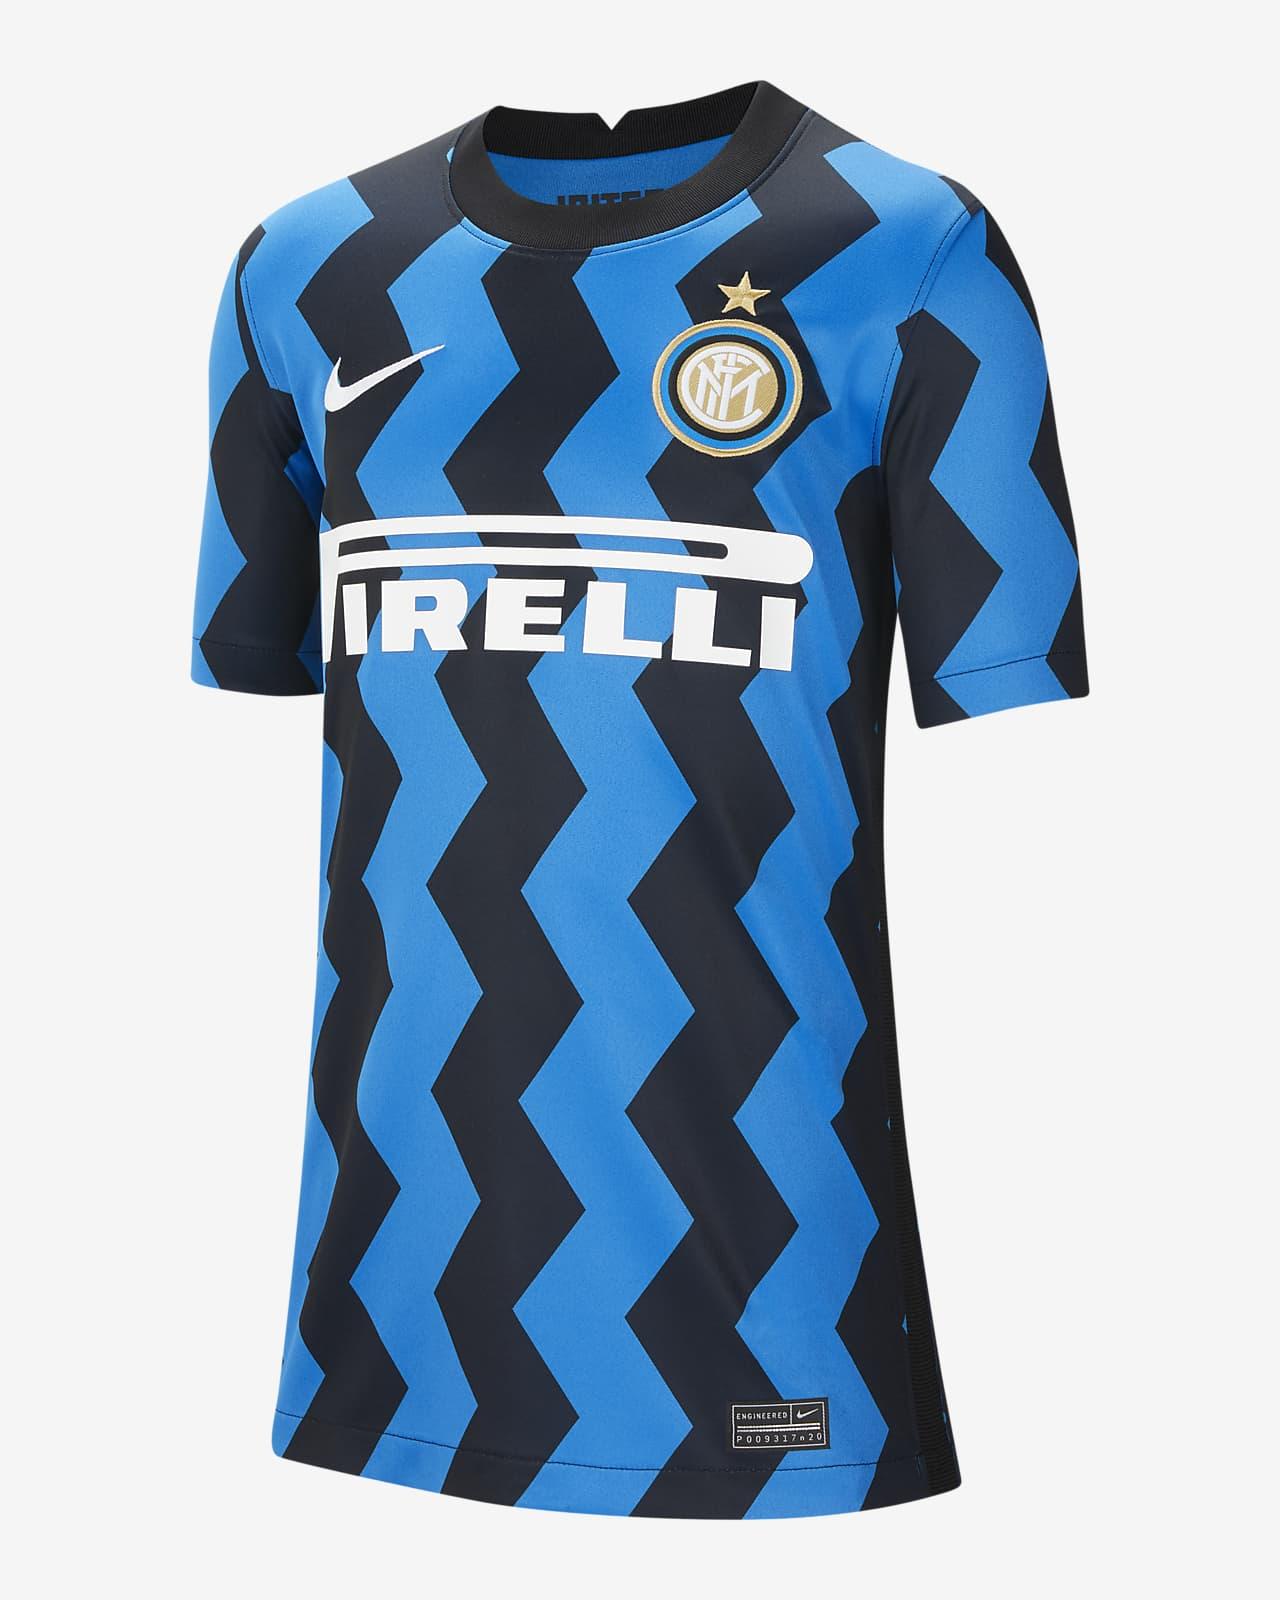 Inter Milan 2020/21 Stadium Thuis Voetbalshirt voor kids